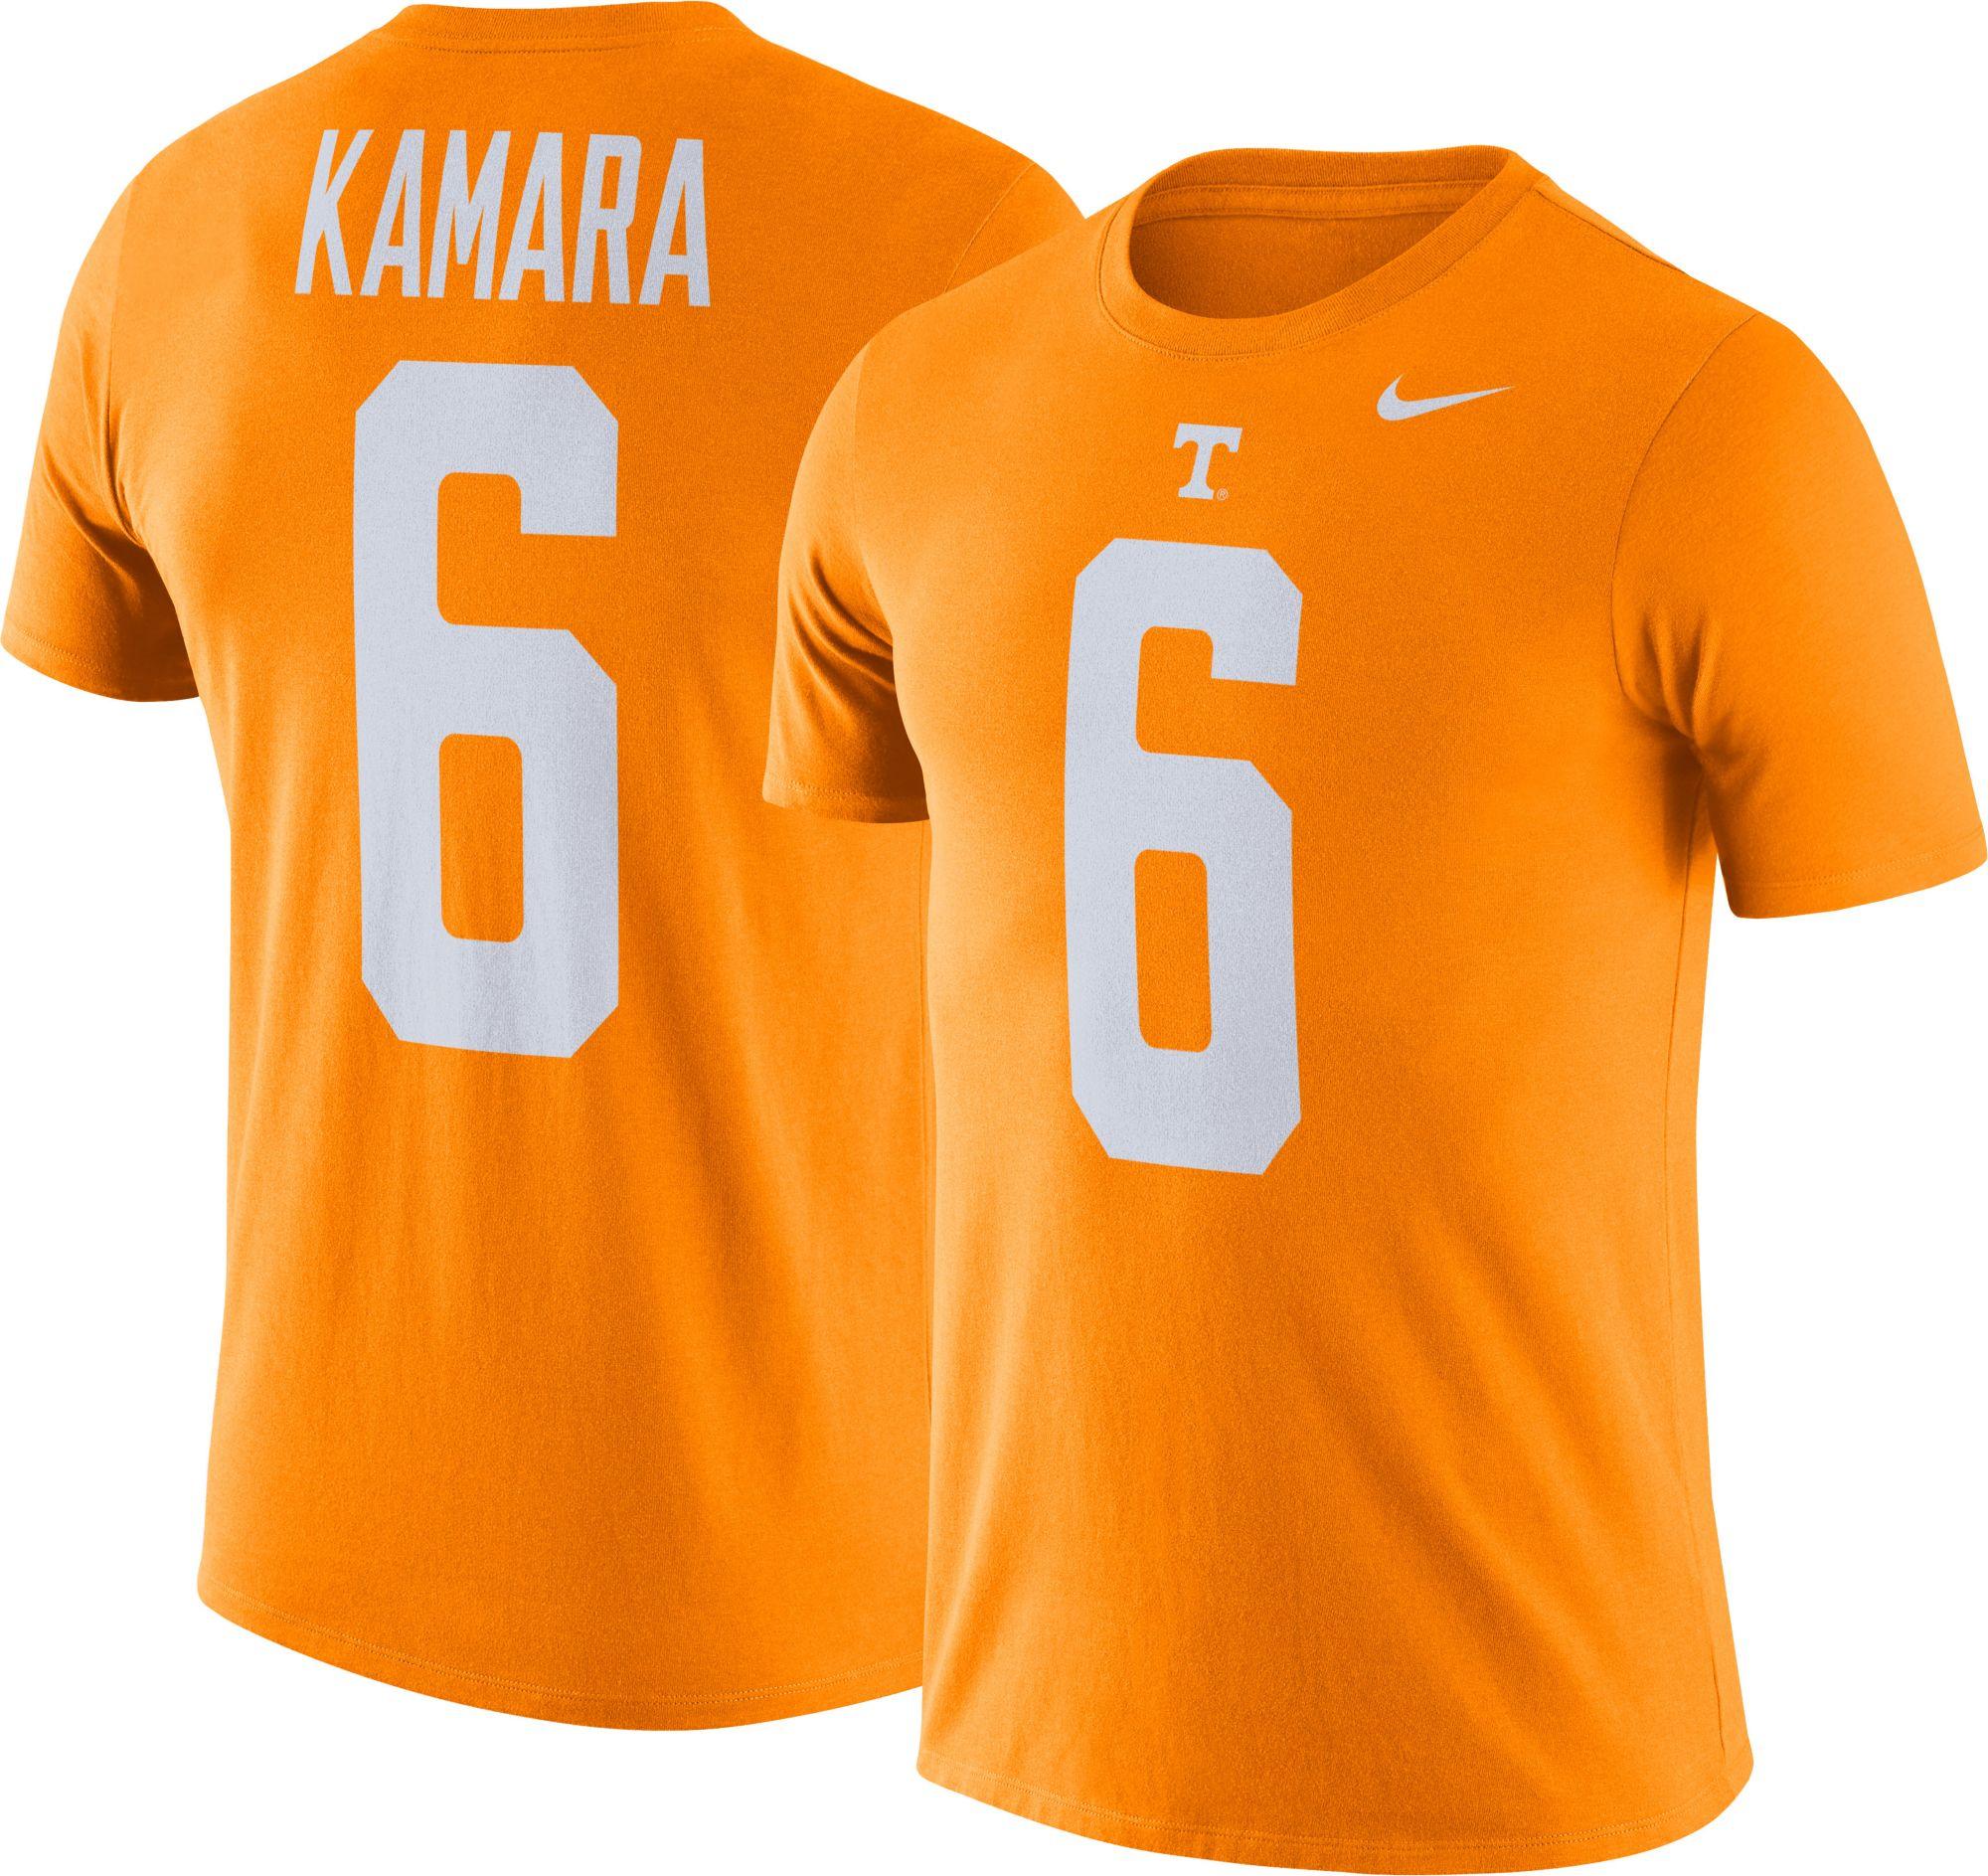 new arrival 37746 007b9 Nike Men's Tennessee Volunteers Alvin Kamara #6 Tennessee ...